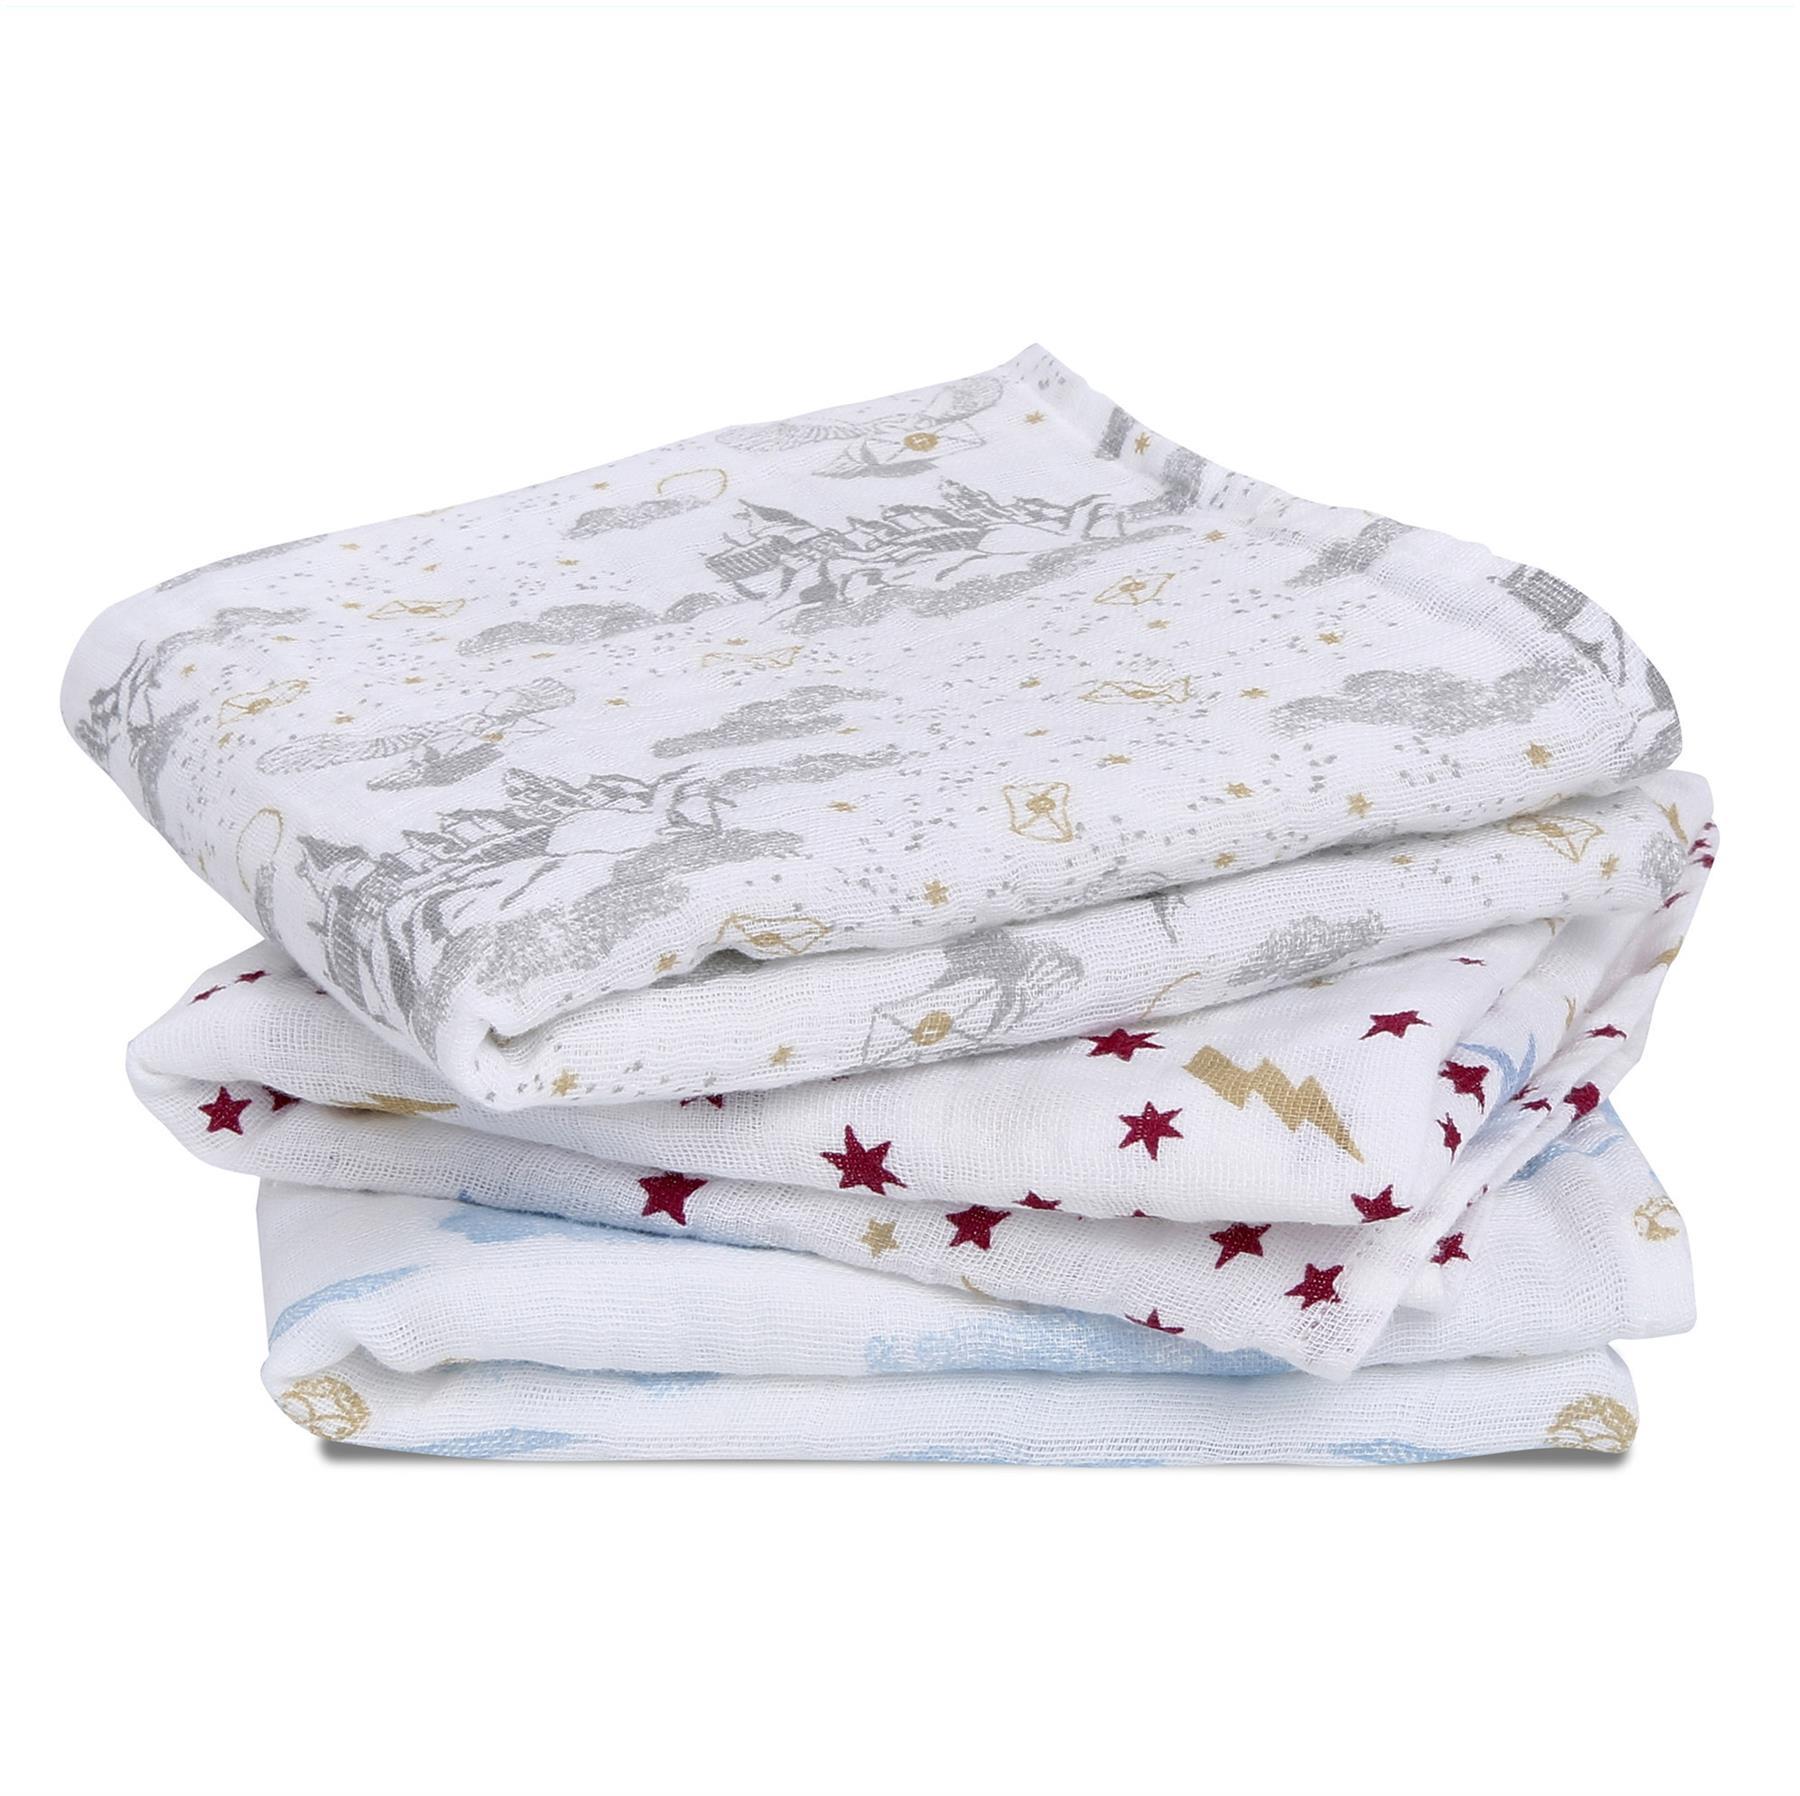 anais 100/% Cotton Muslin swaddles Harry Potter 120 x 120cm 3 Pack aden